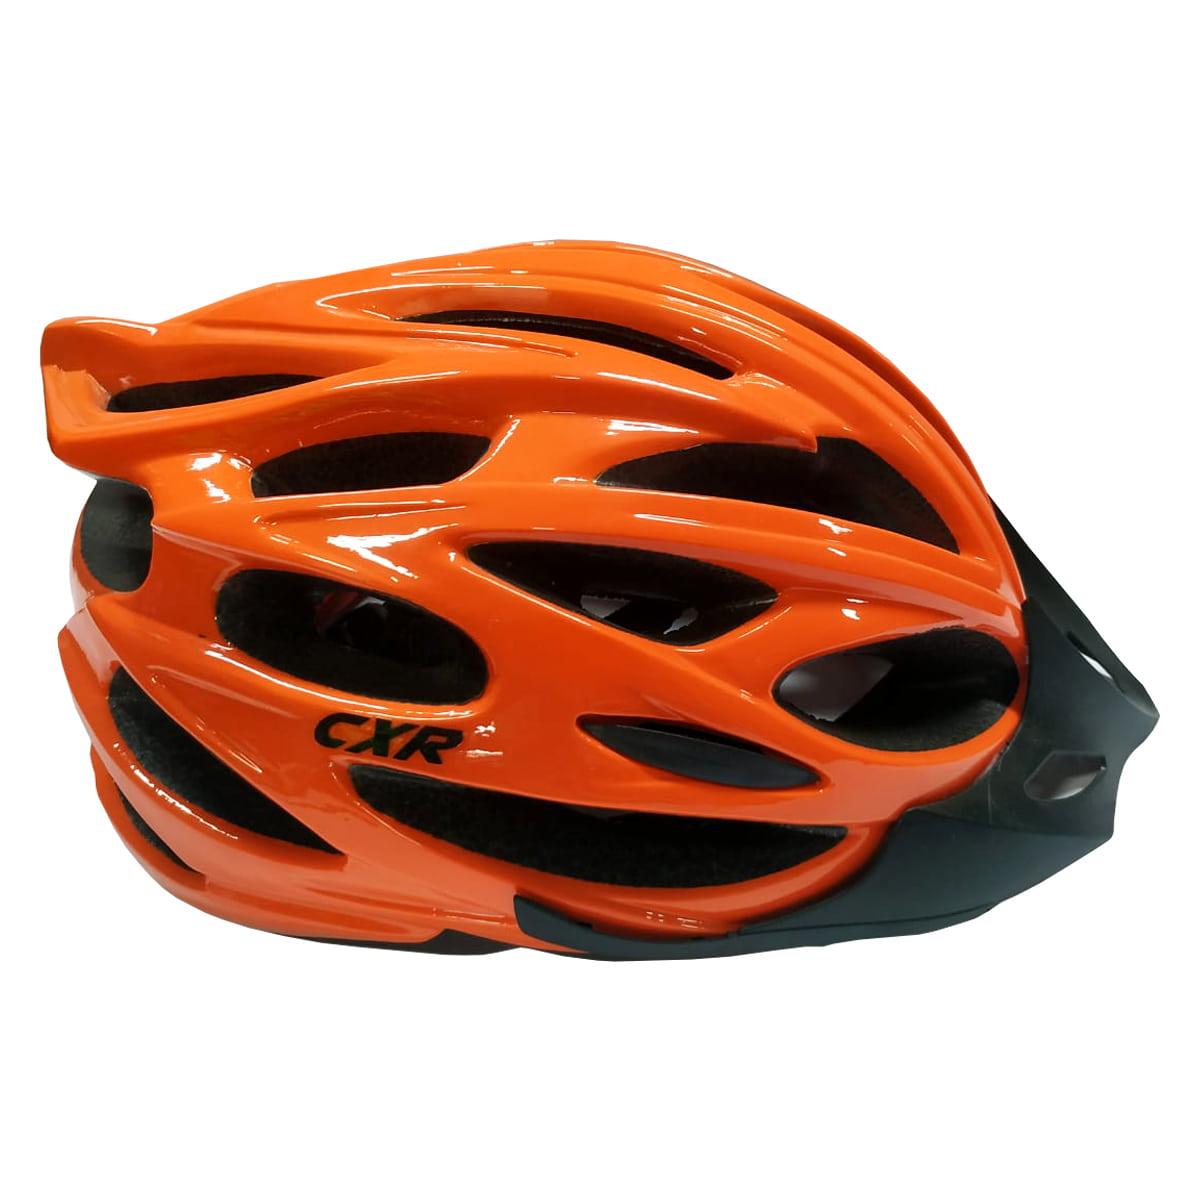 Capacete Ciclismo CXR Laranja com Luz